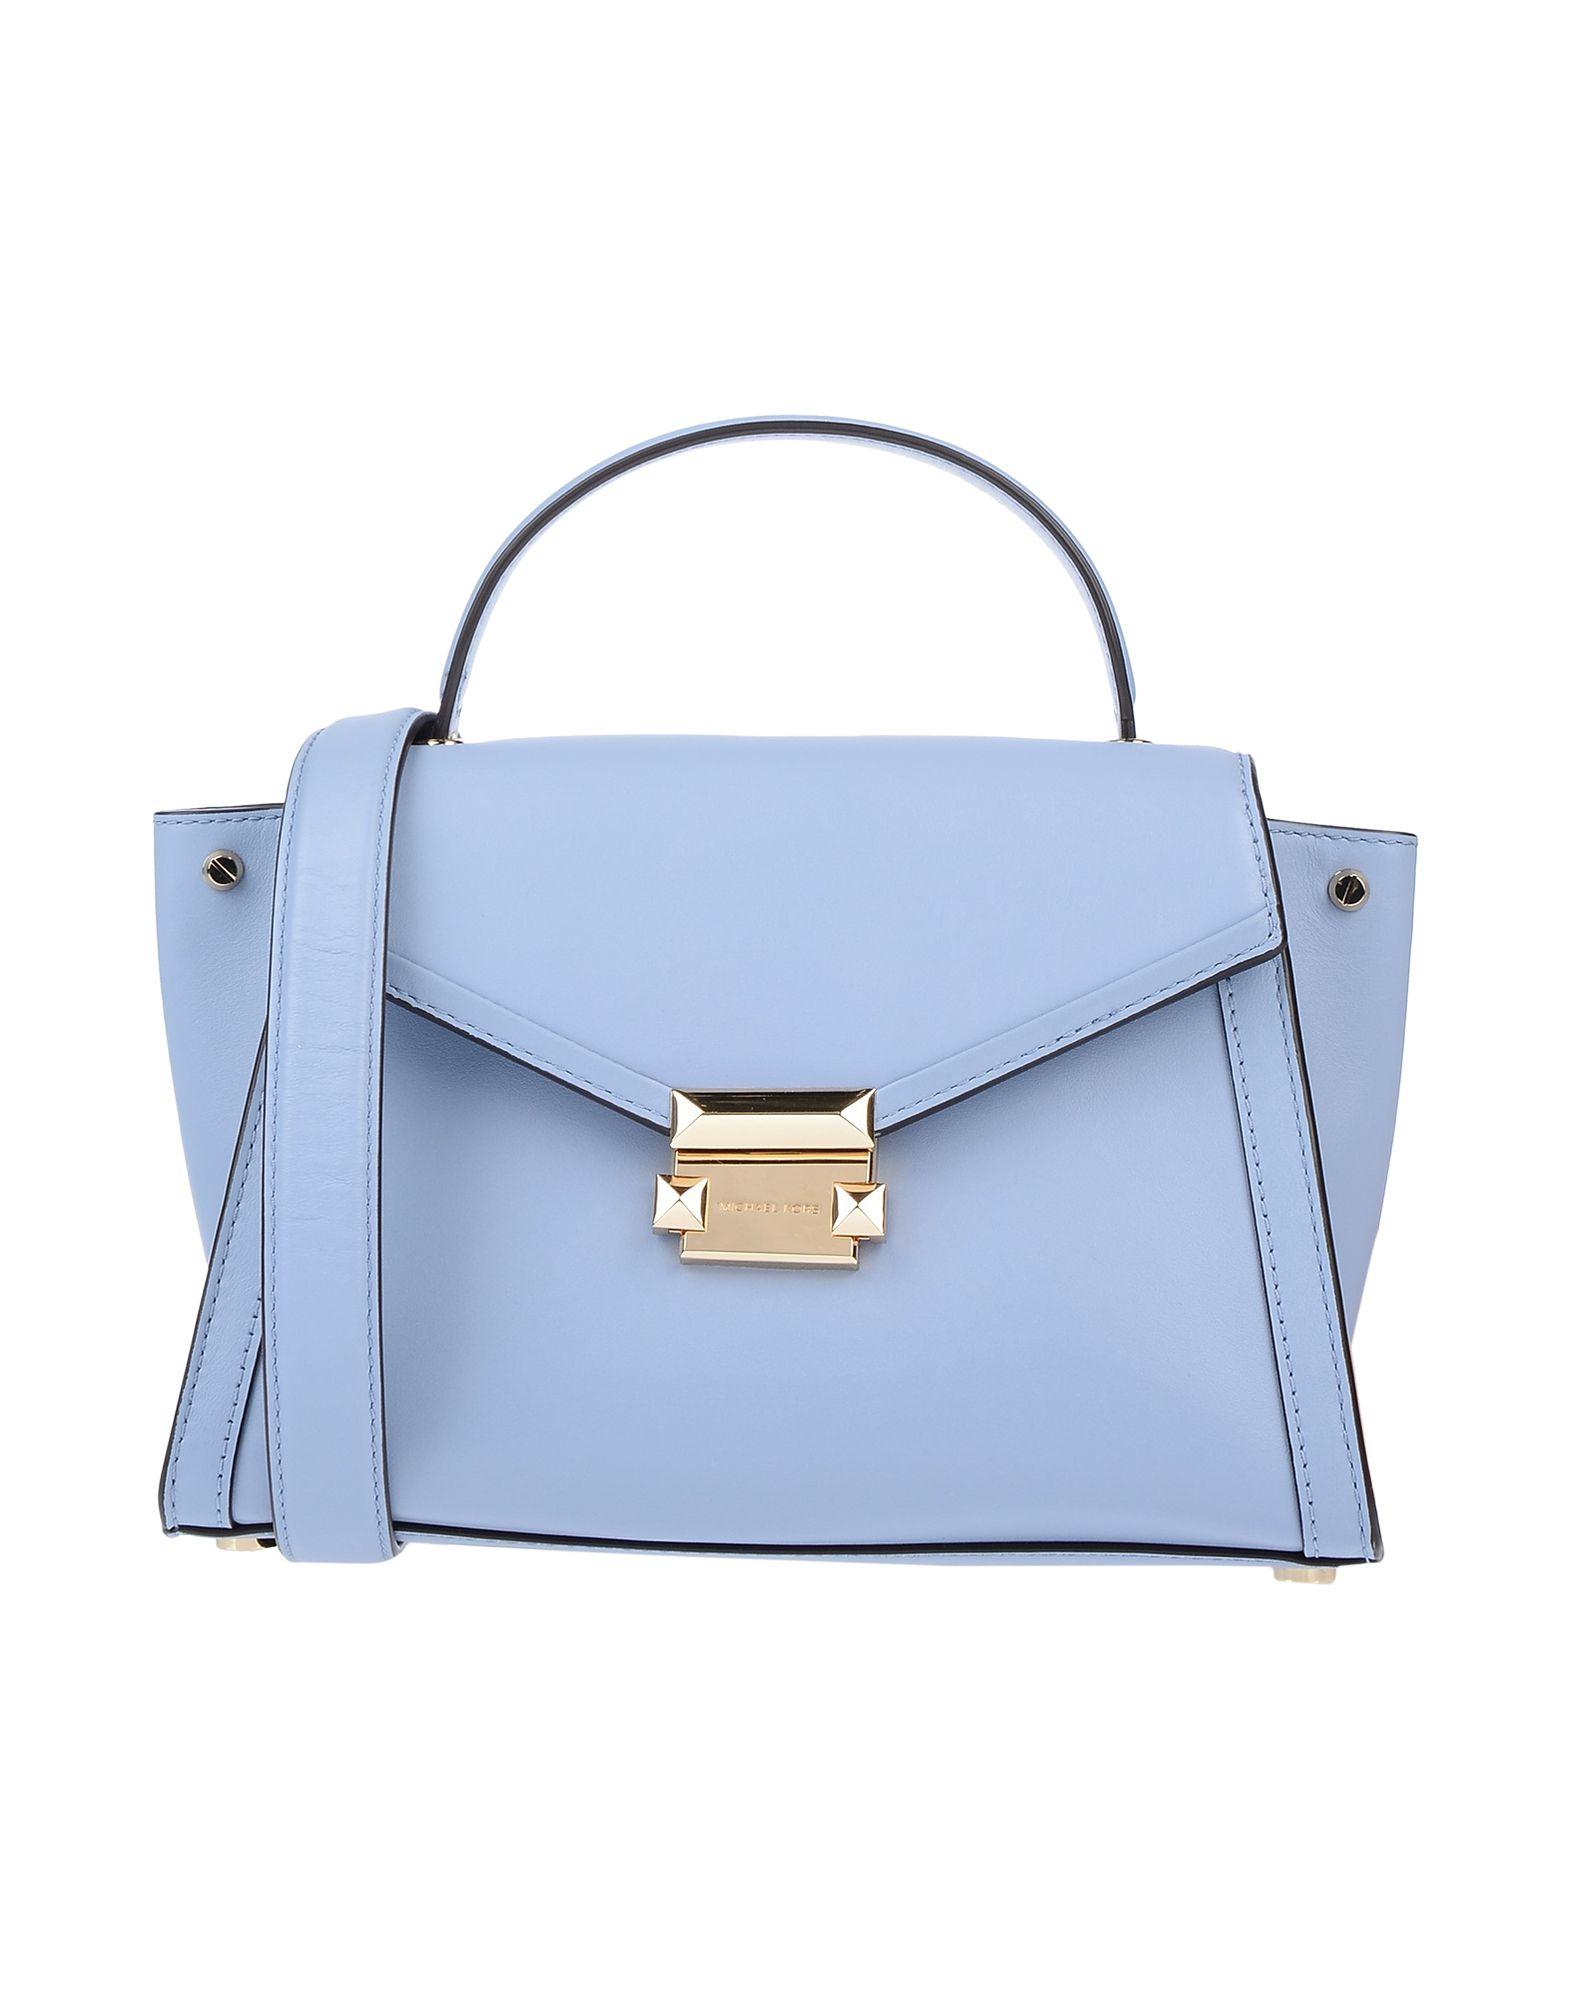 e93e30ec7ae760 Lyst - MICHAEL Michael Kors Handbag in Blue